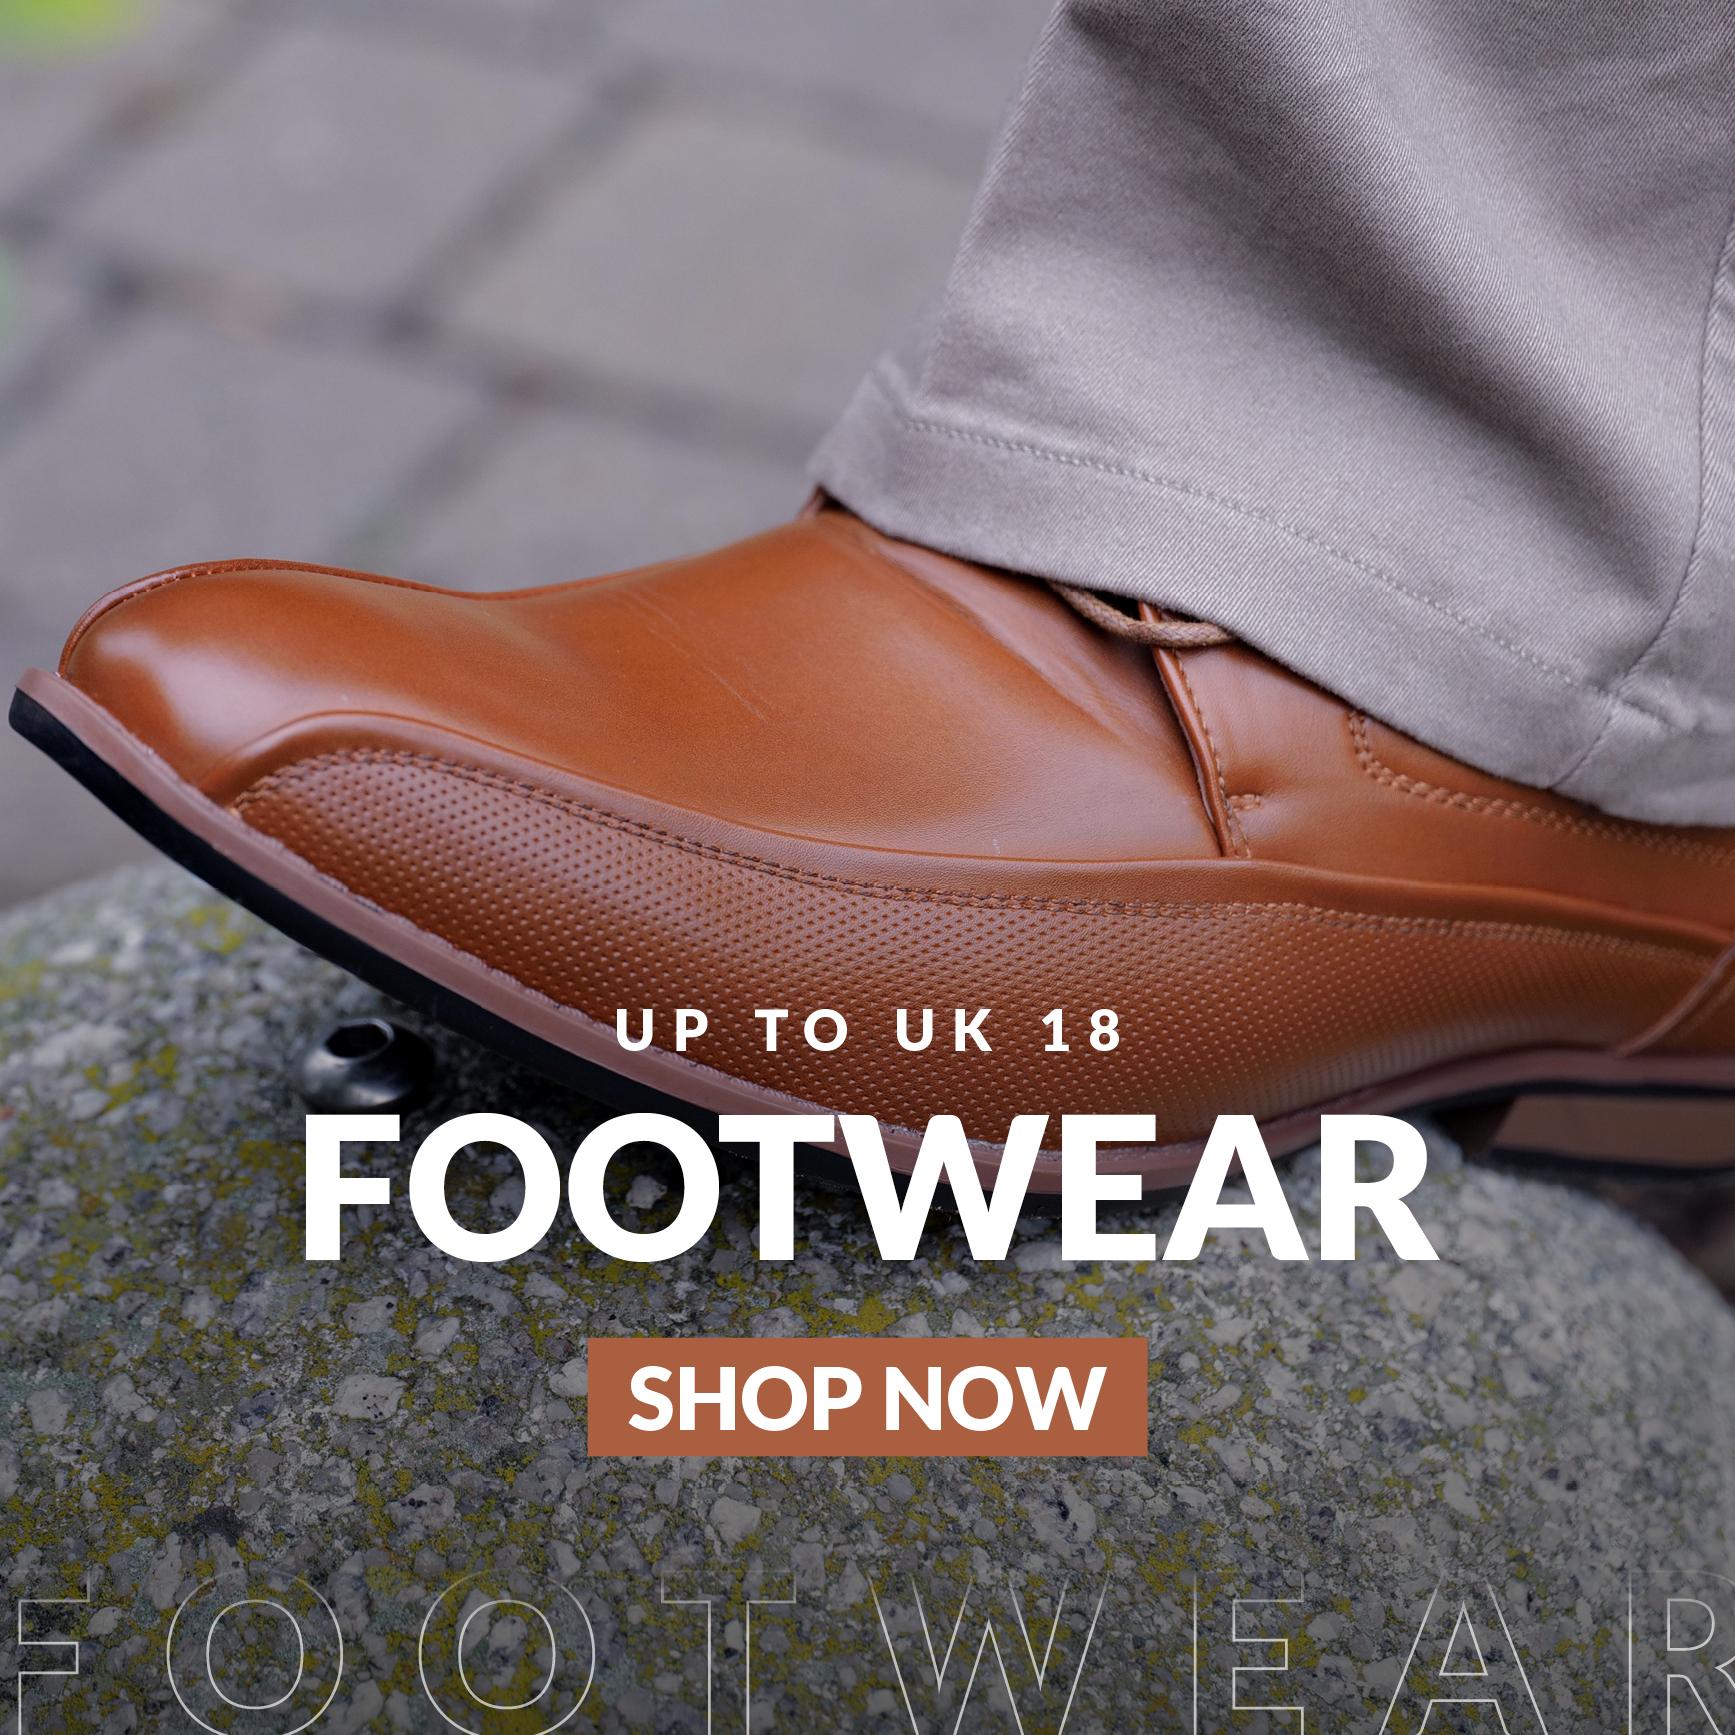 Summer Styles Footwear at BC4U